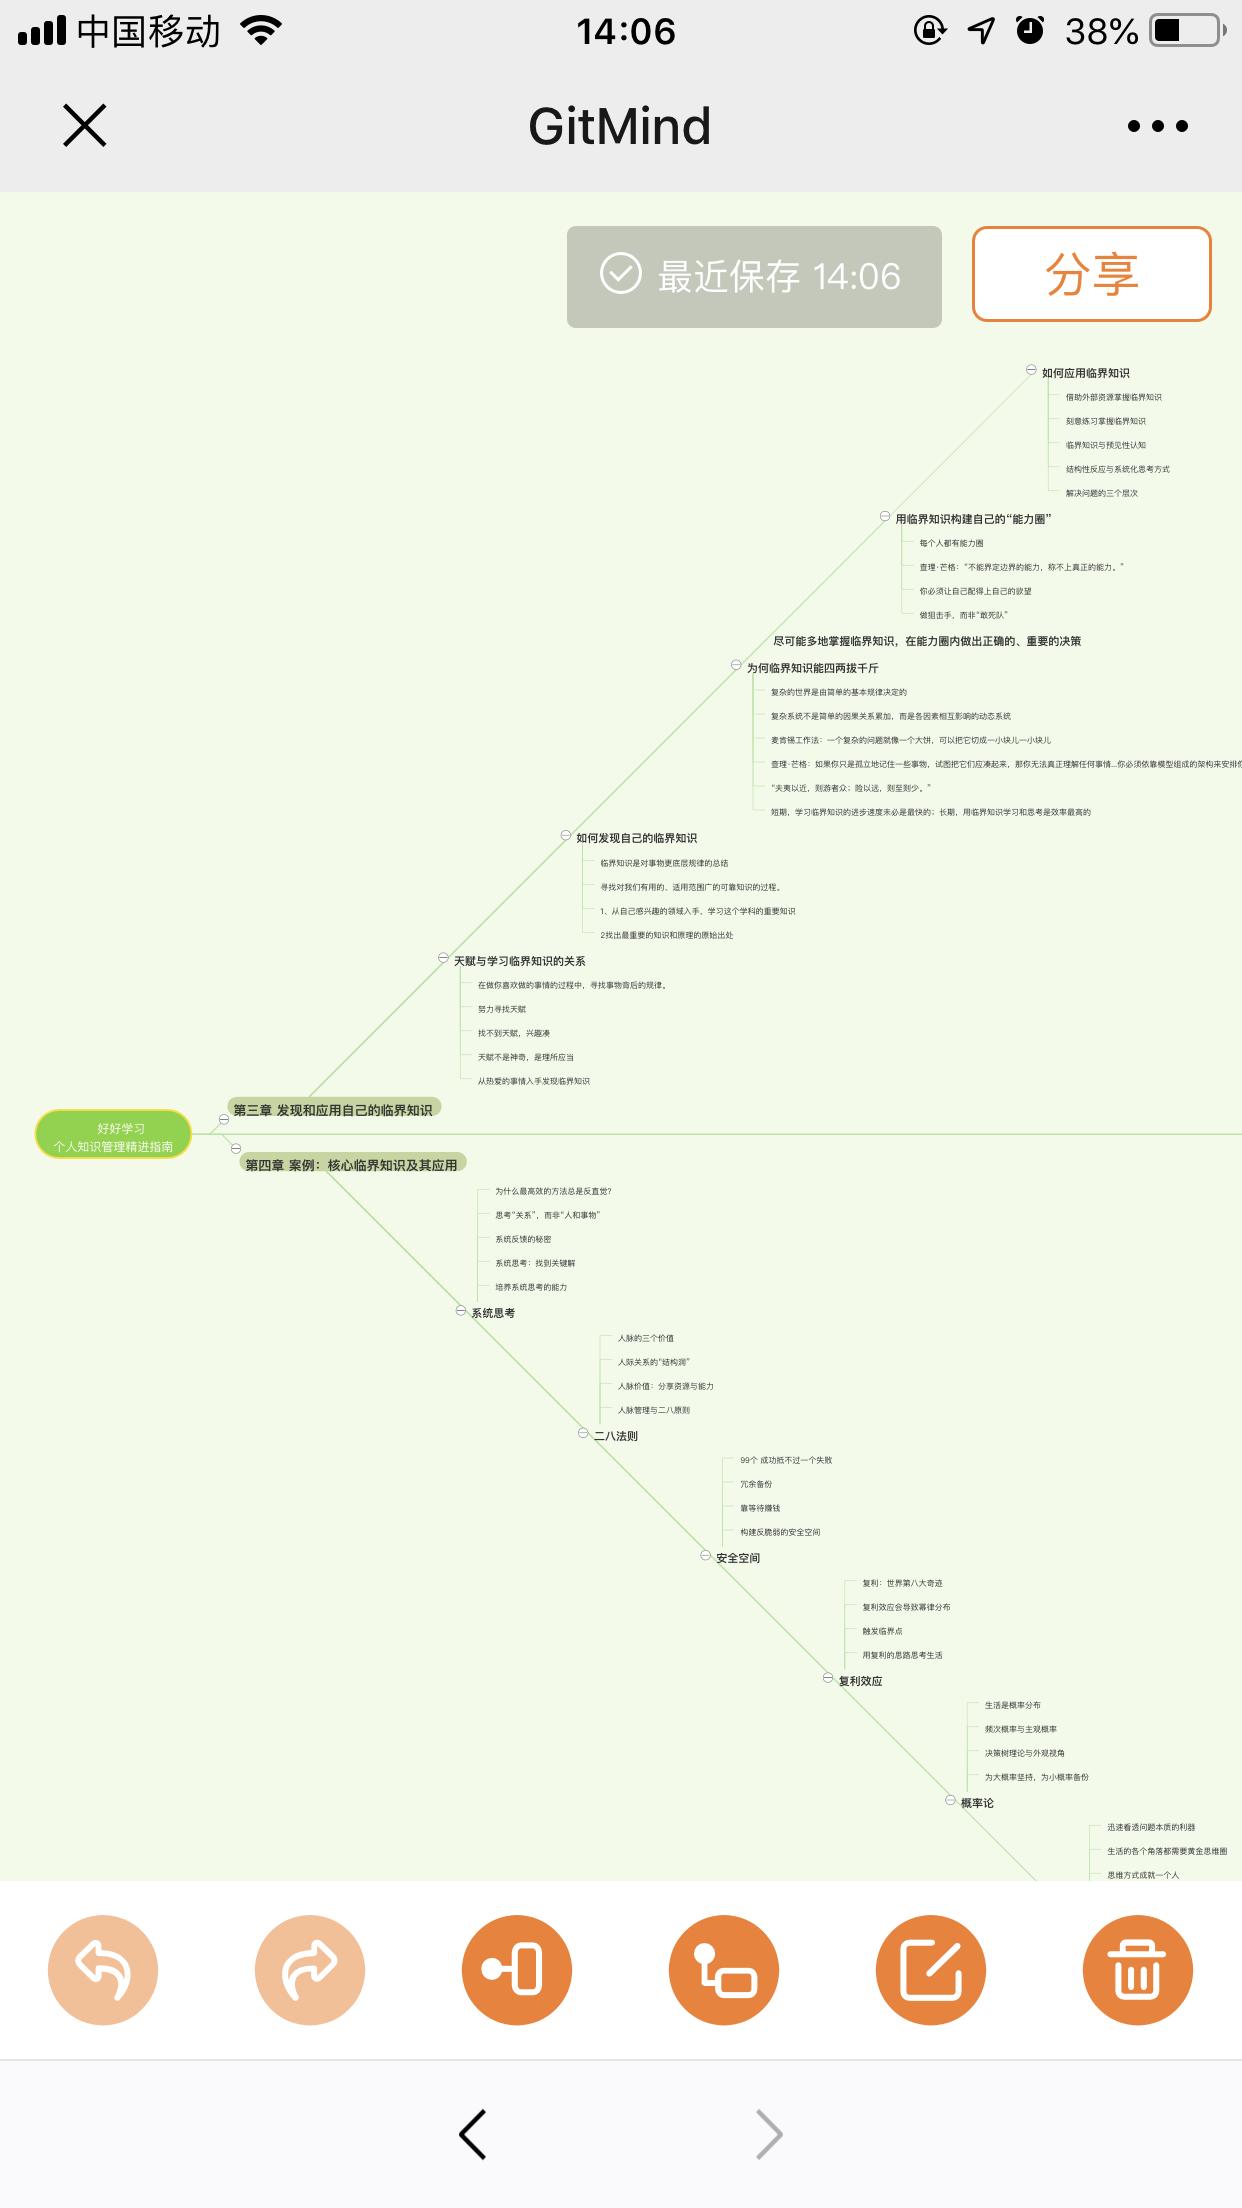 GitMind - 一图胜千言,免费的多人协作思维导图工具,做读书笔记很巴适 2